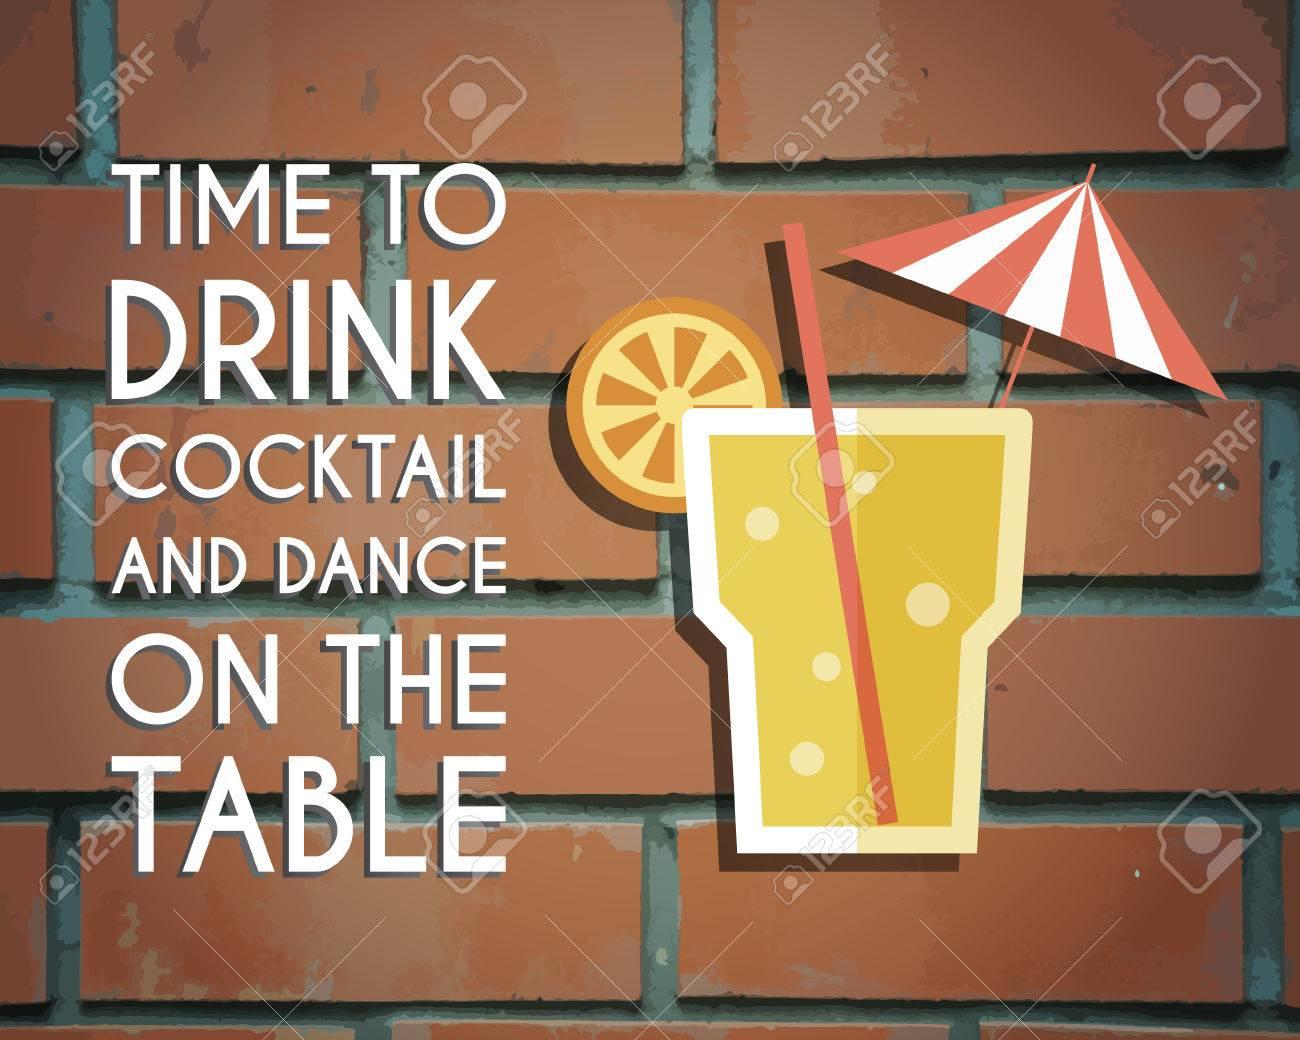 Poster design keywords - Retro Poster Design For Cocktail Lounge Bar Cocktail Party Concept With Keywords Sign Vintage